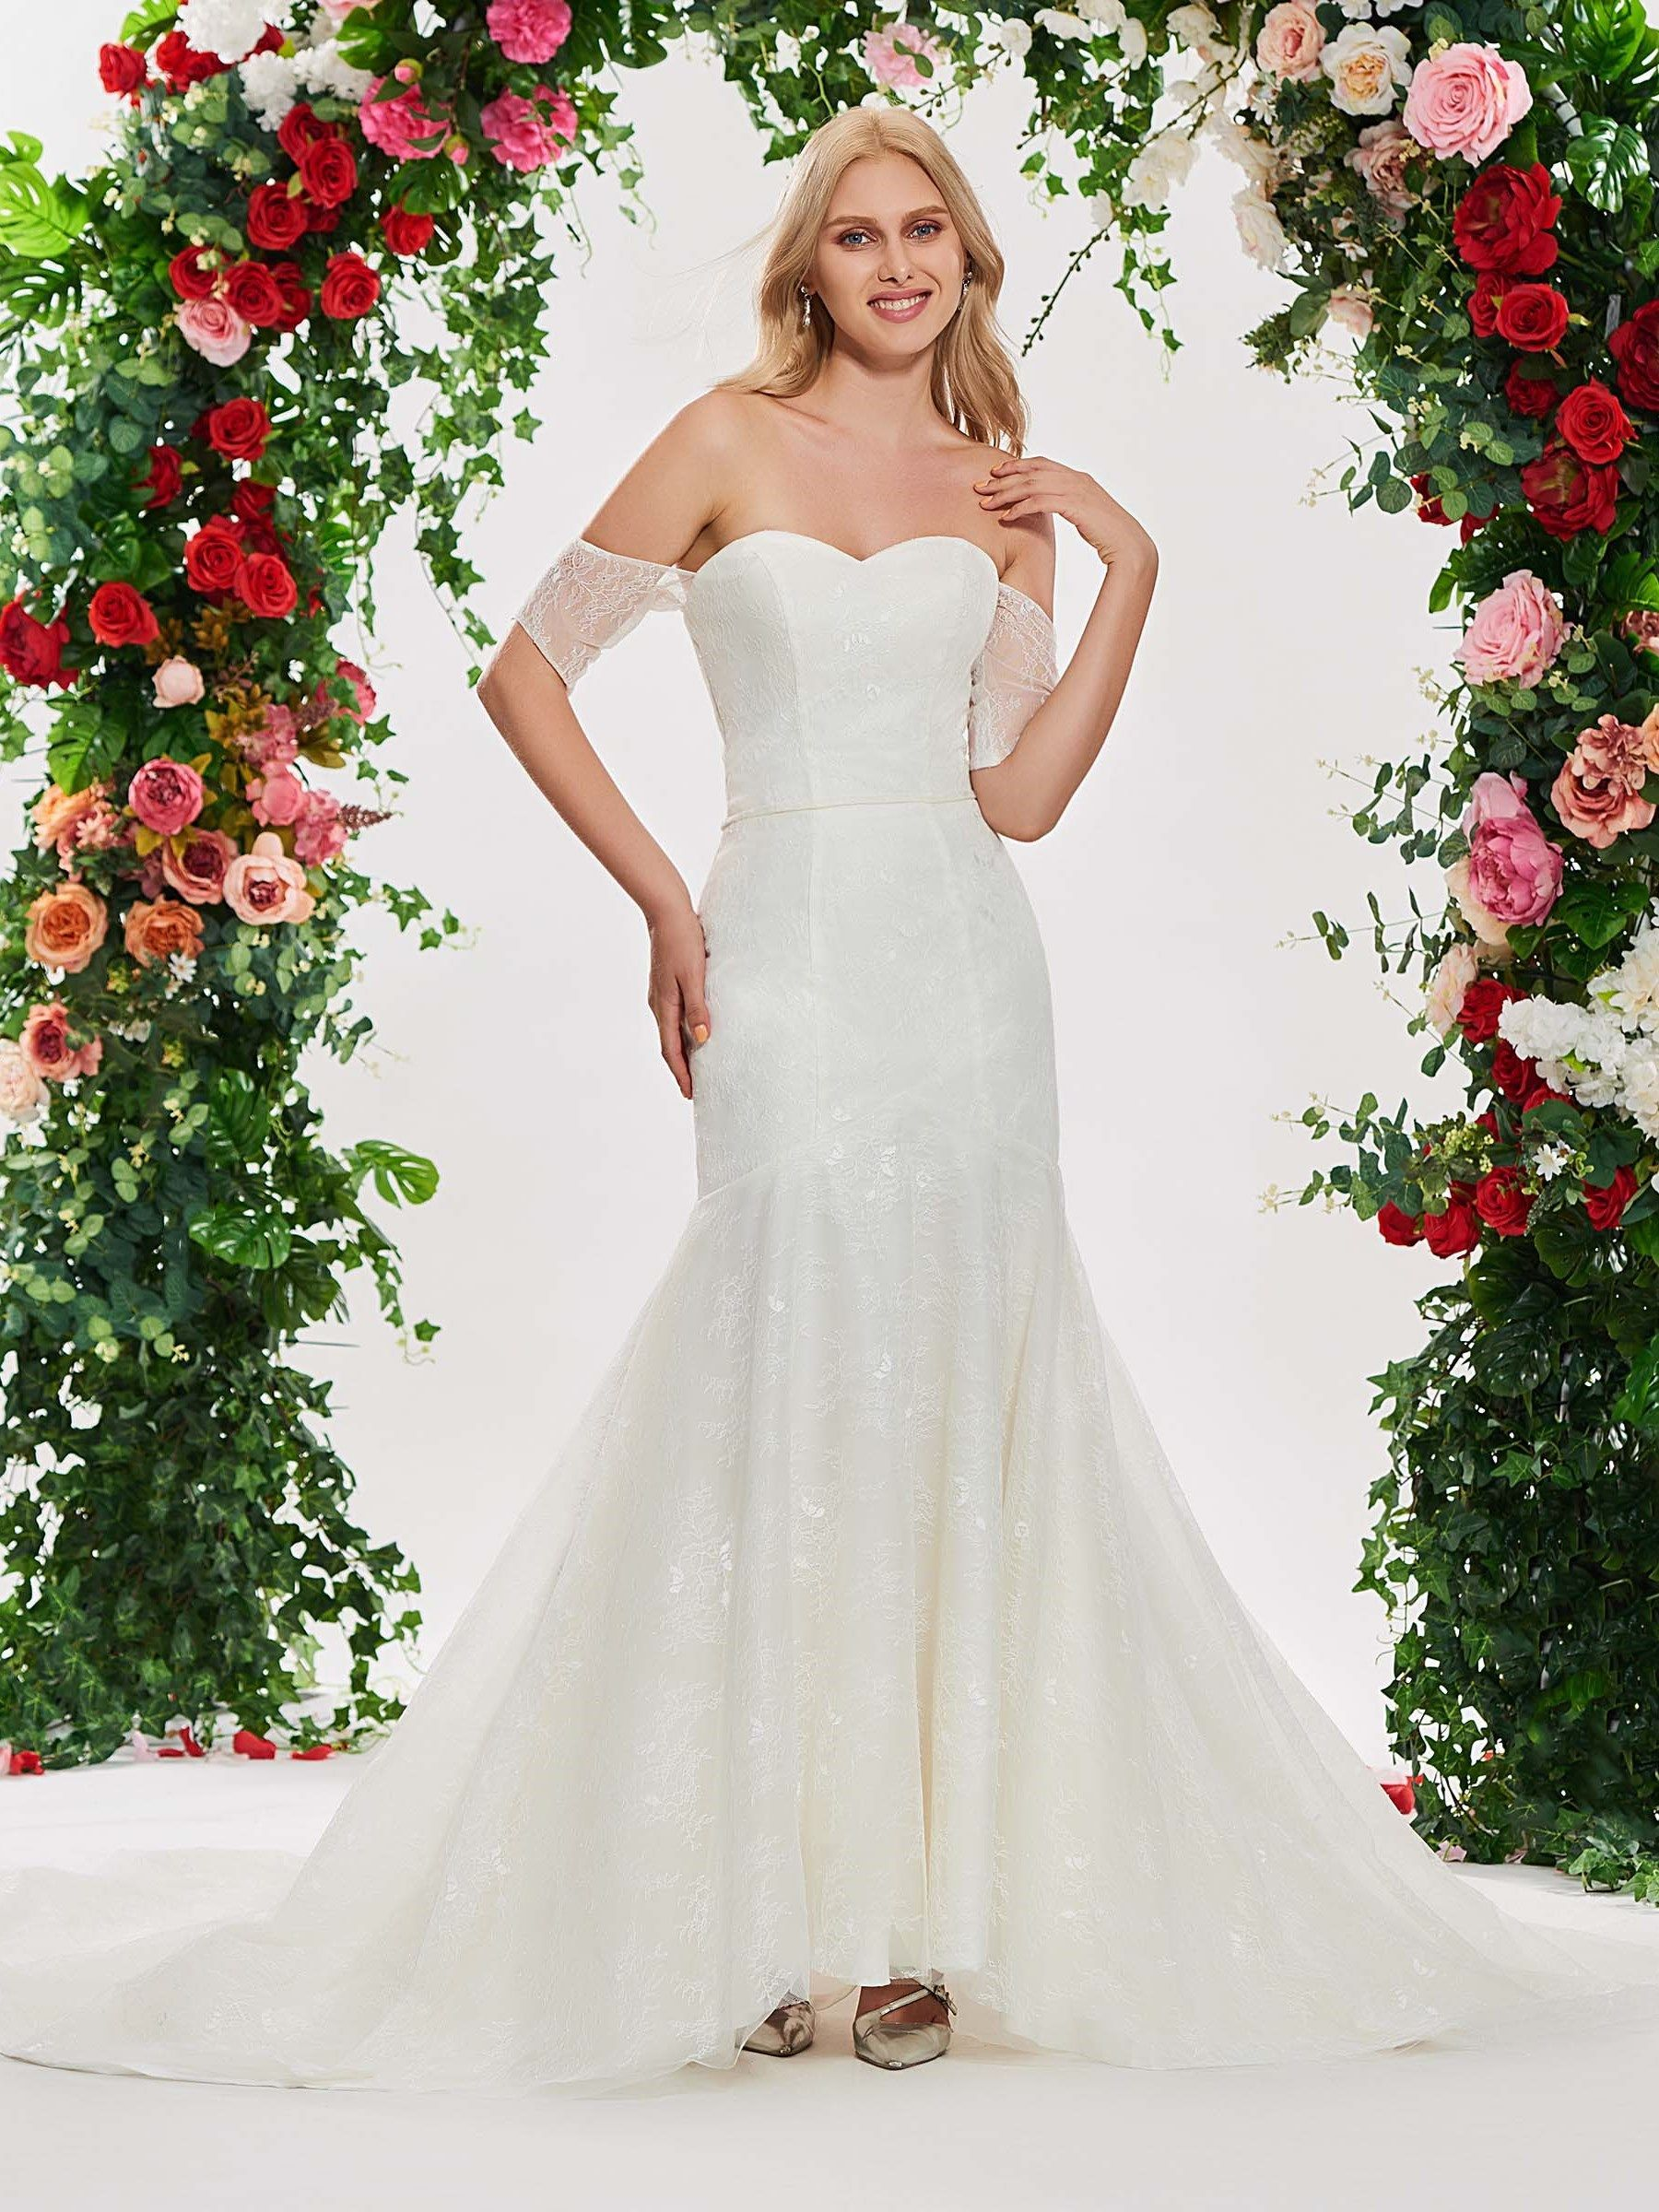 Mermaid lace wedding dress  Short Sleeve Off the Shoulder Mermaid Lace Wedding Dress  Wedding